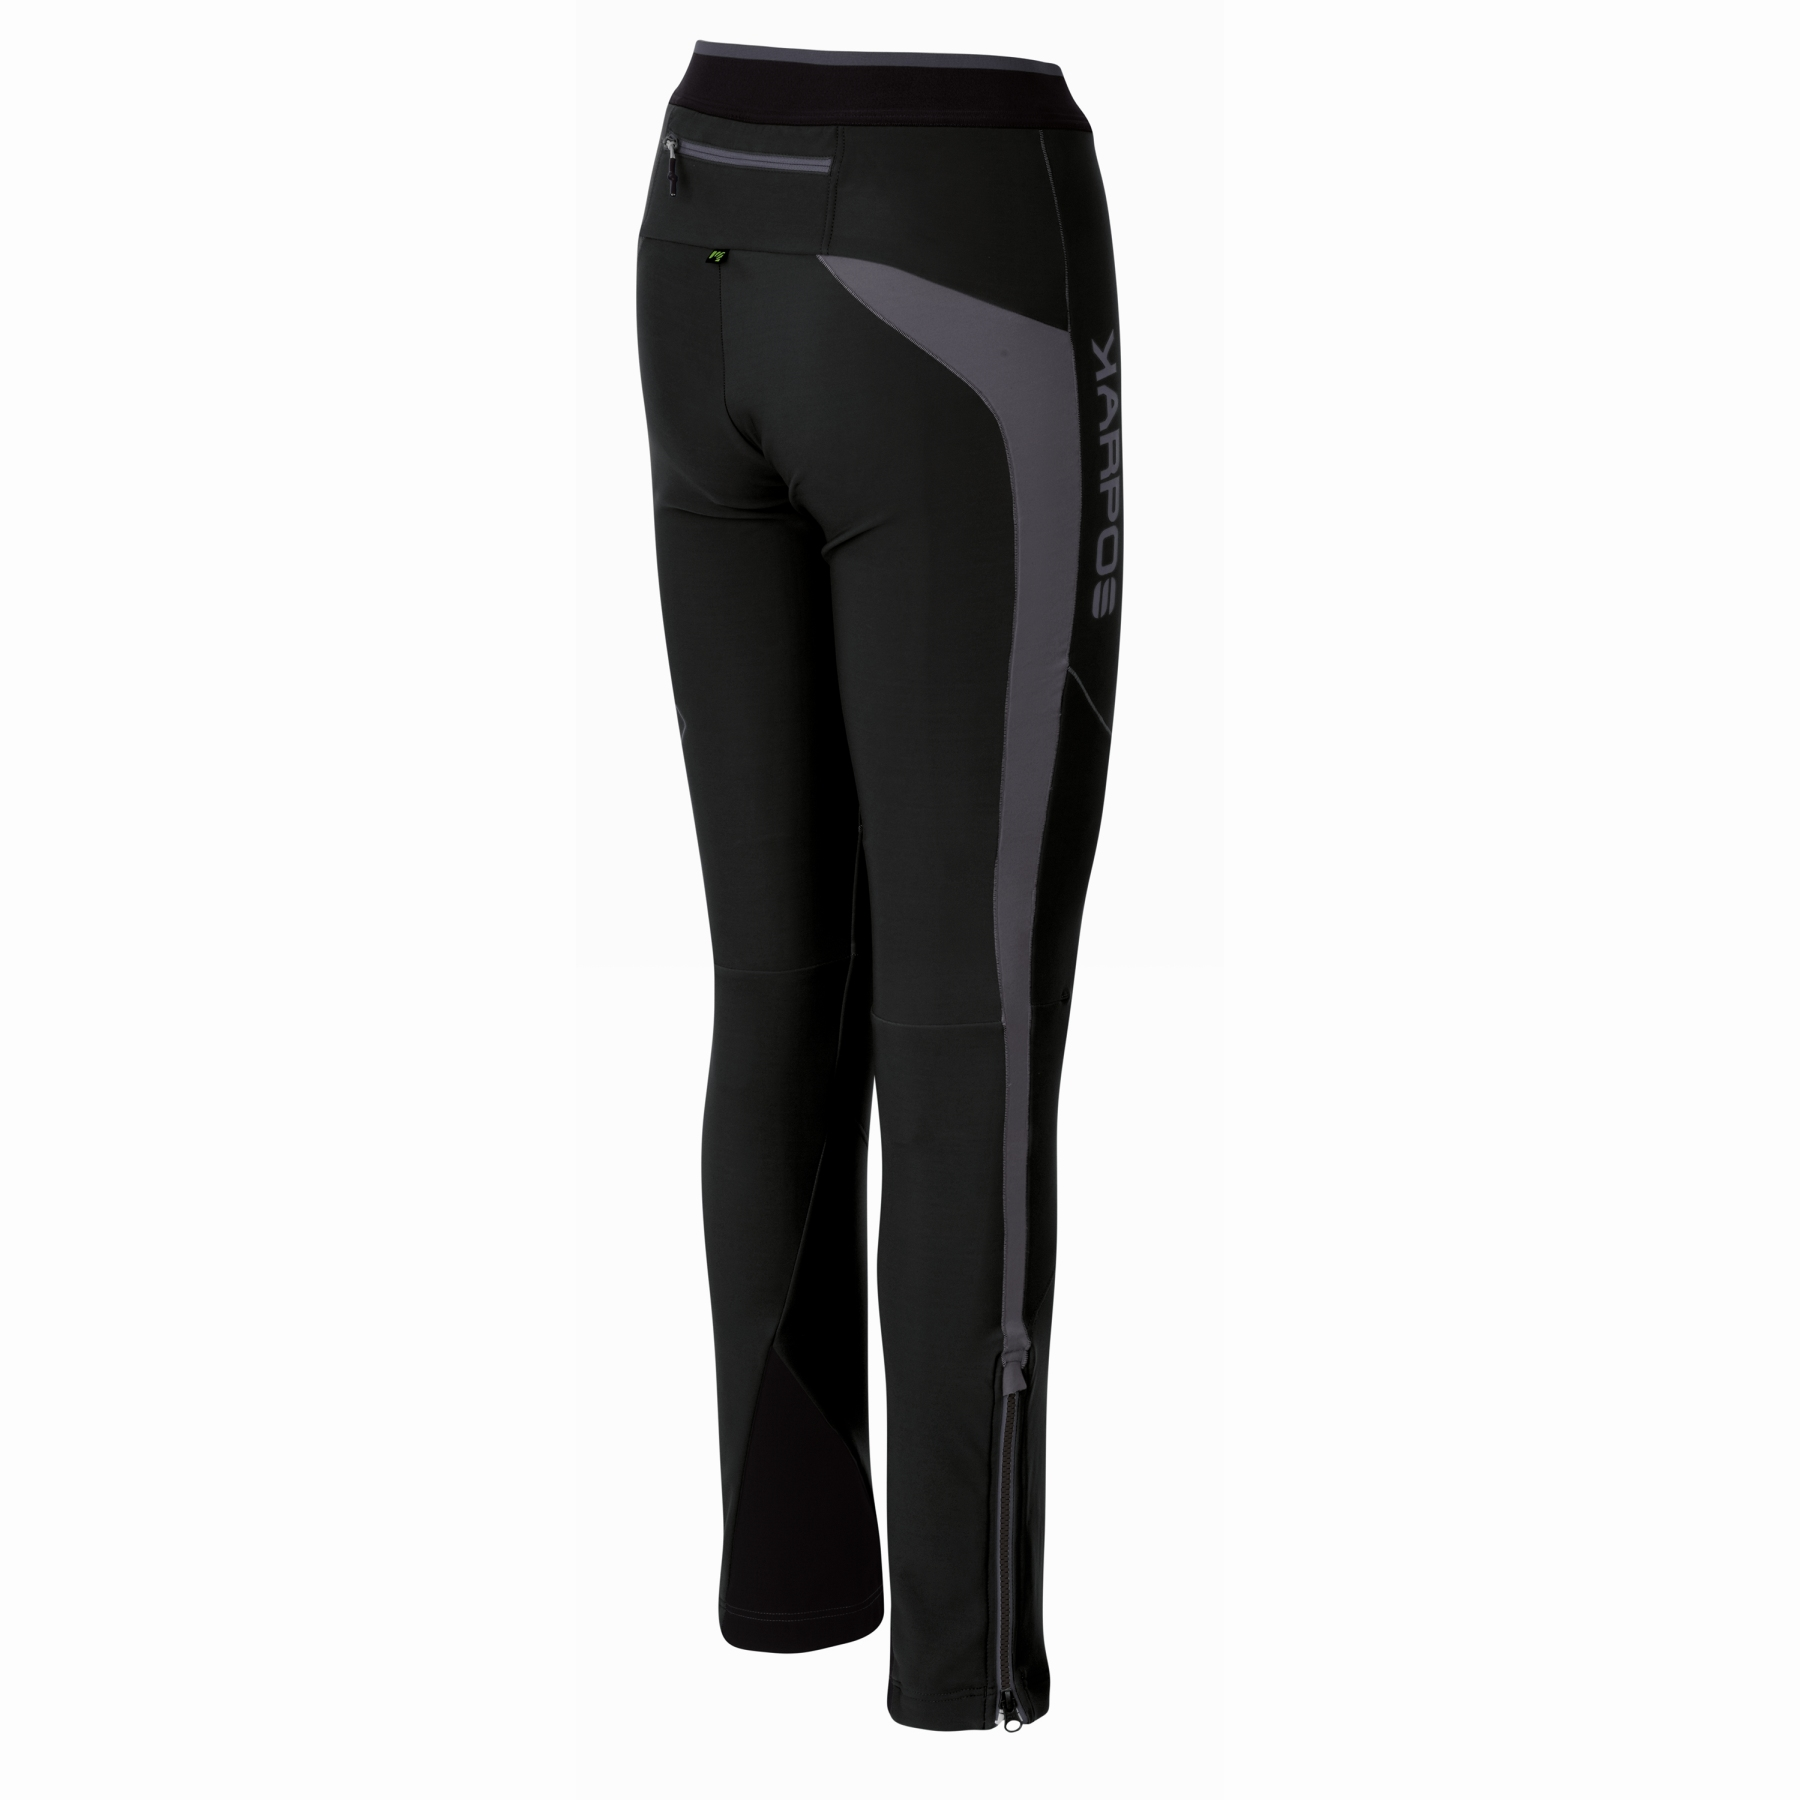 Image of Karpos Alagna Evo Women's Pants - black dark grey